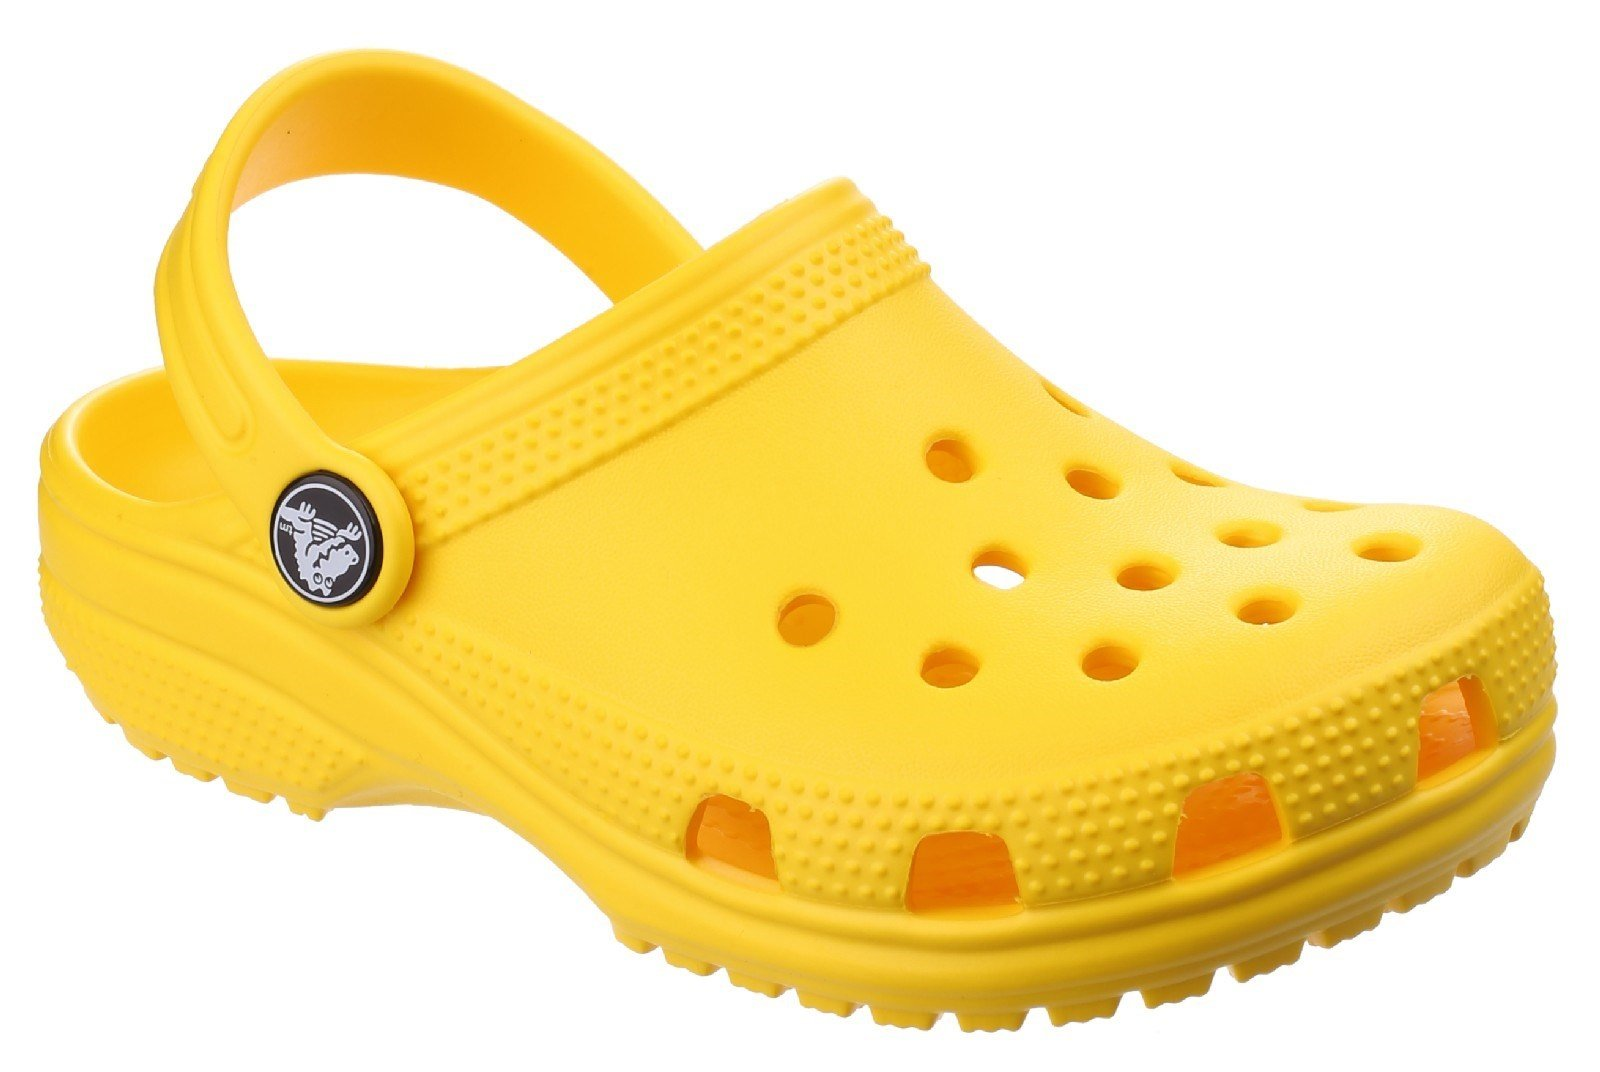 Crocs Kid's Classic Clog Slip On Sandal Various Colours 25239 - Lemon 4 UK